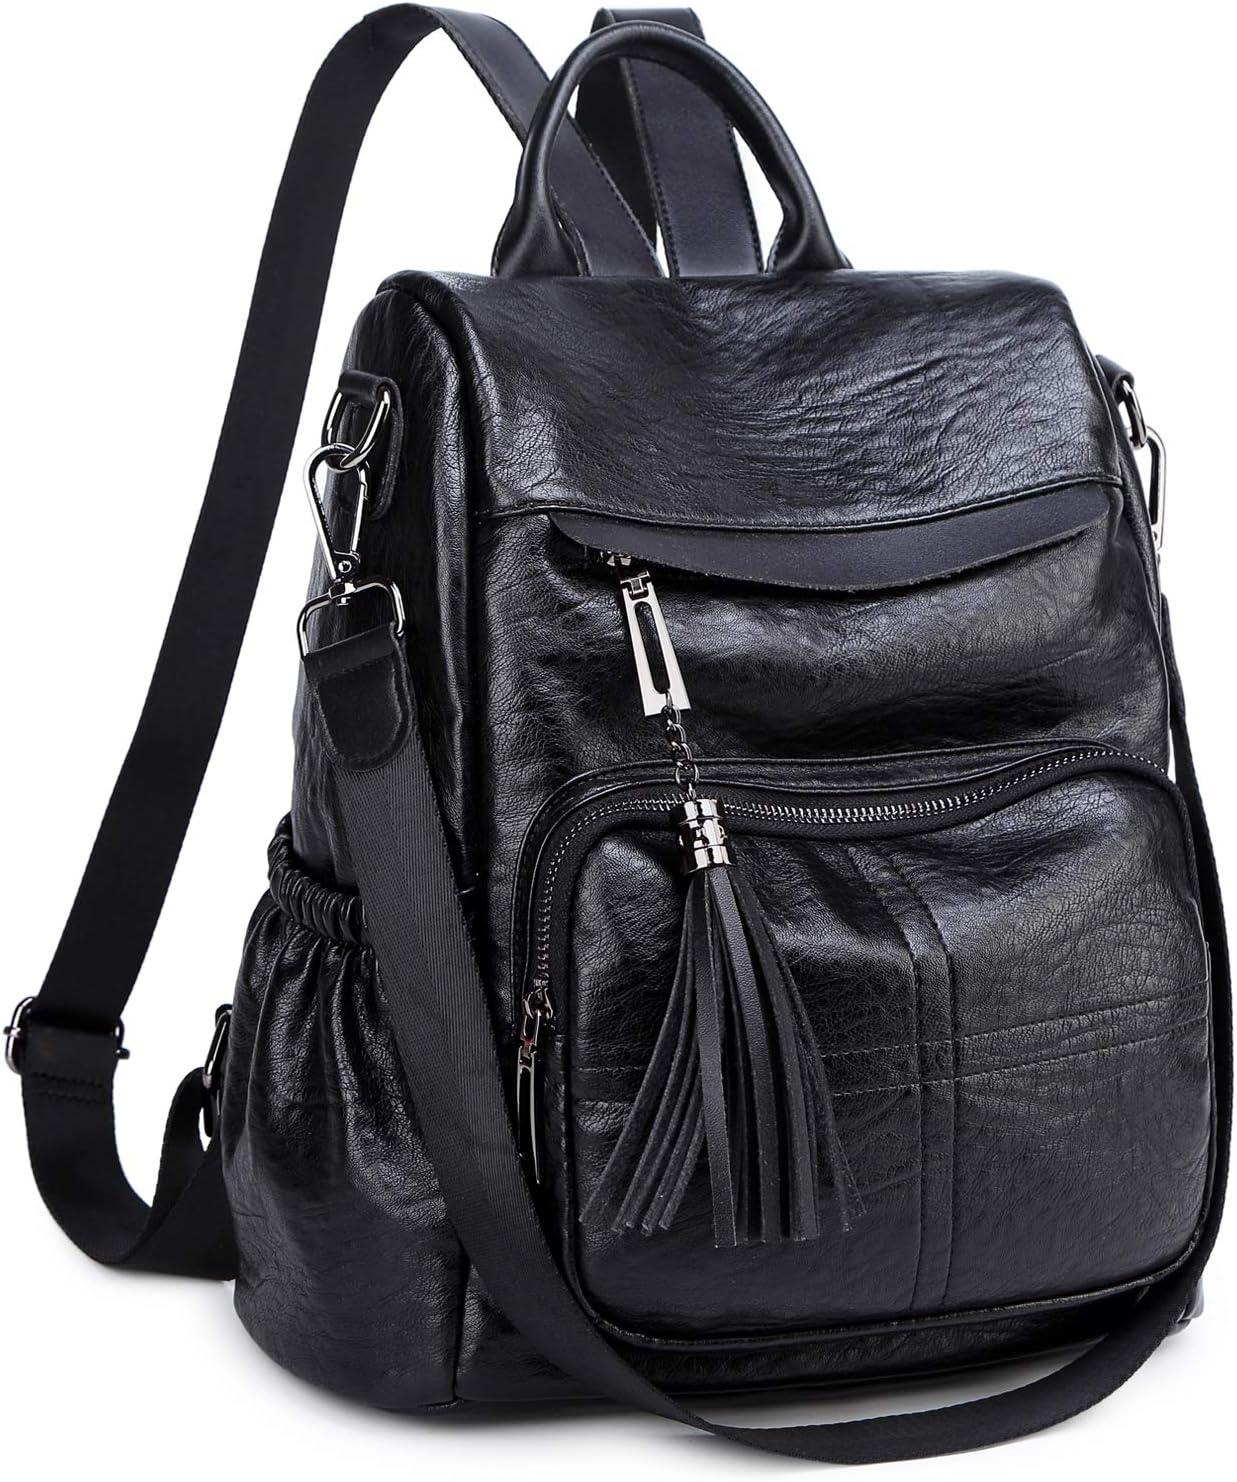 Women Backpack Purse PU Leather Convertible Shoulder Bag Antitheft Rucksack (Black)